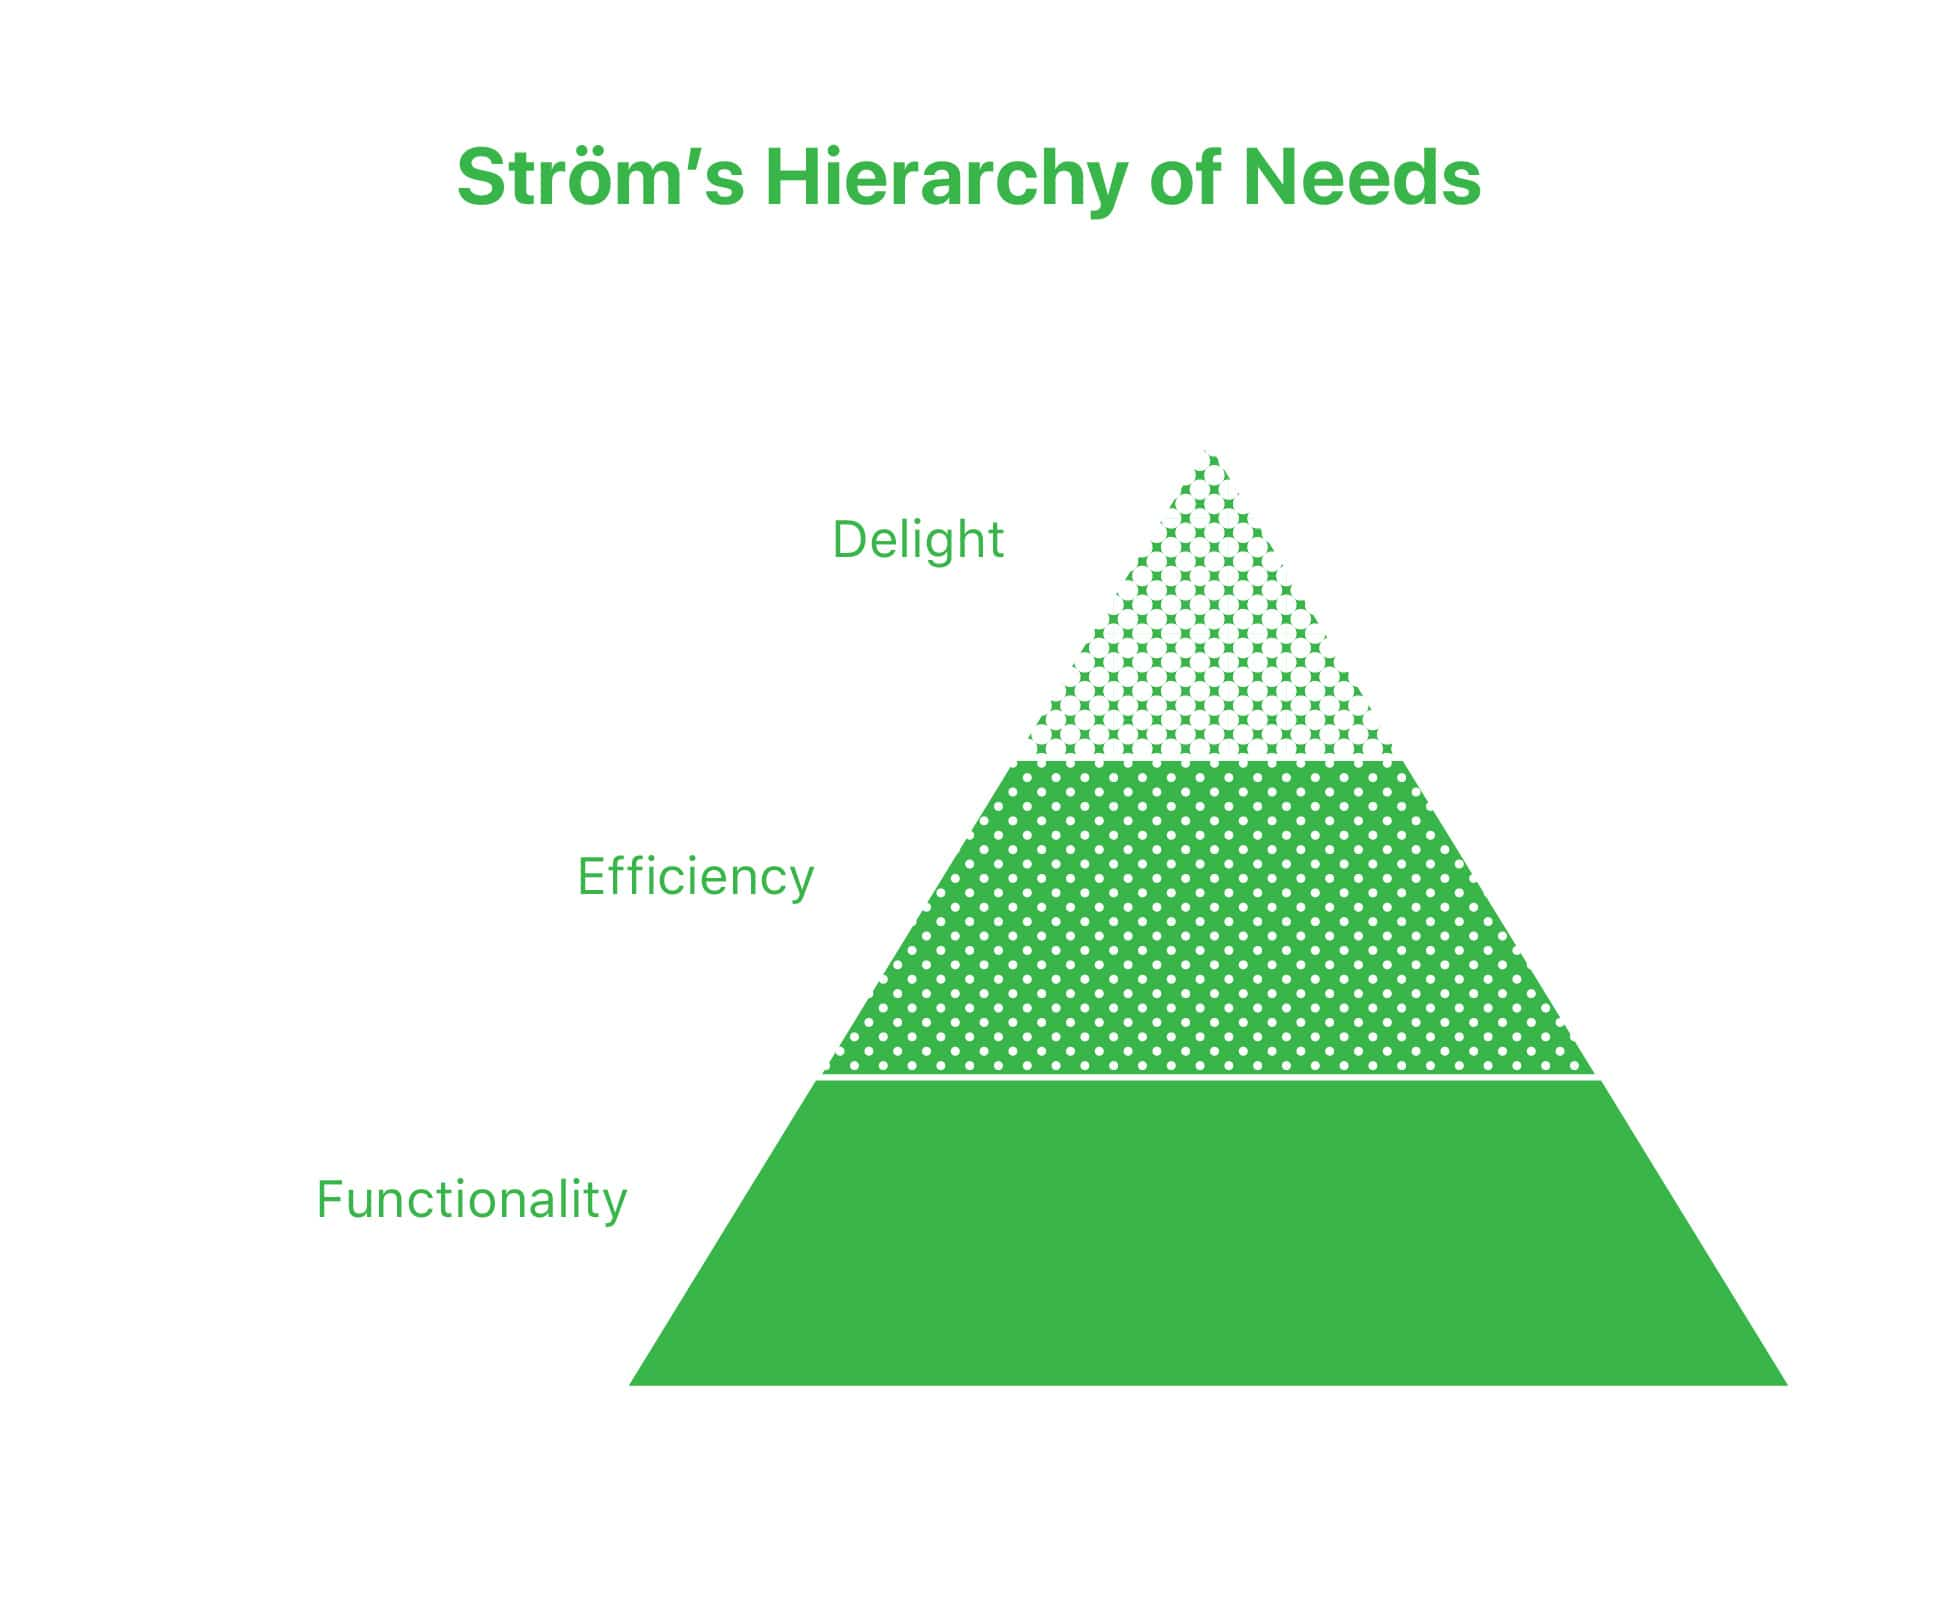 Ström's Hierarchy of Needs